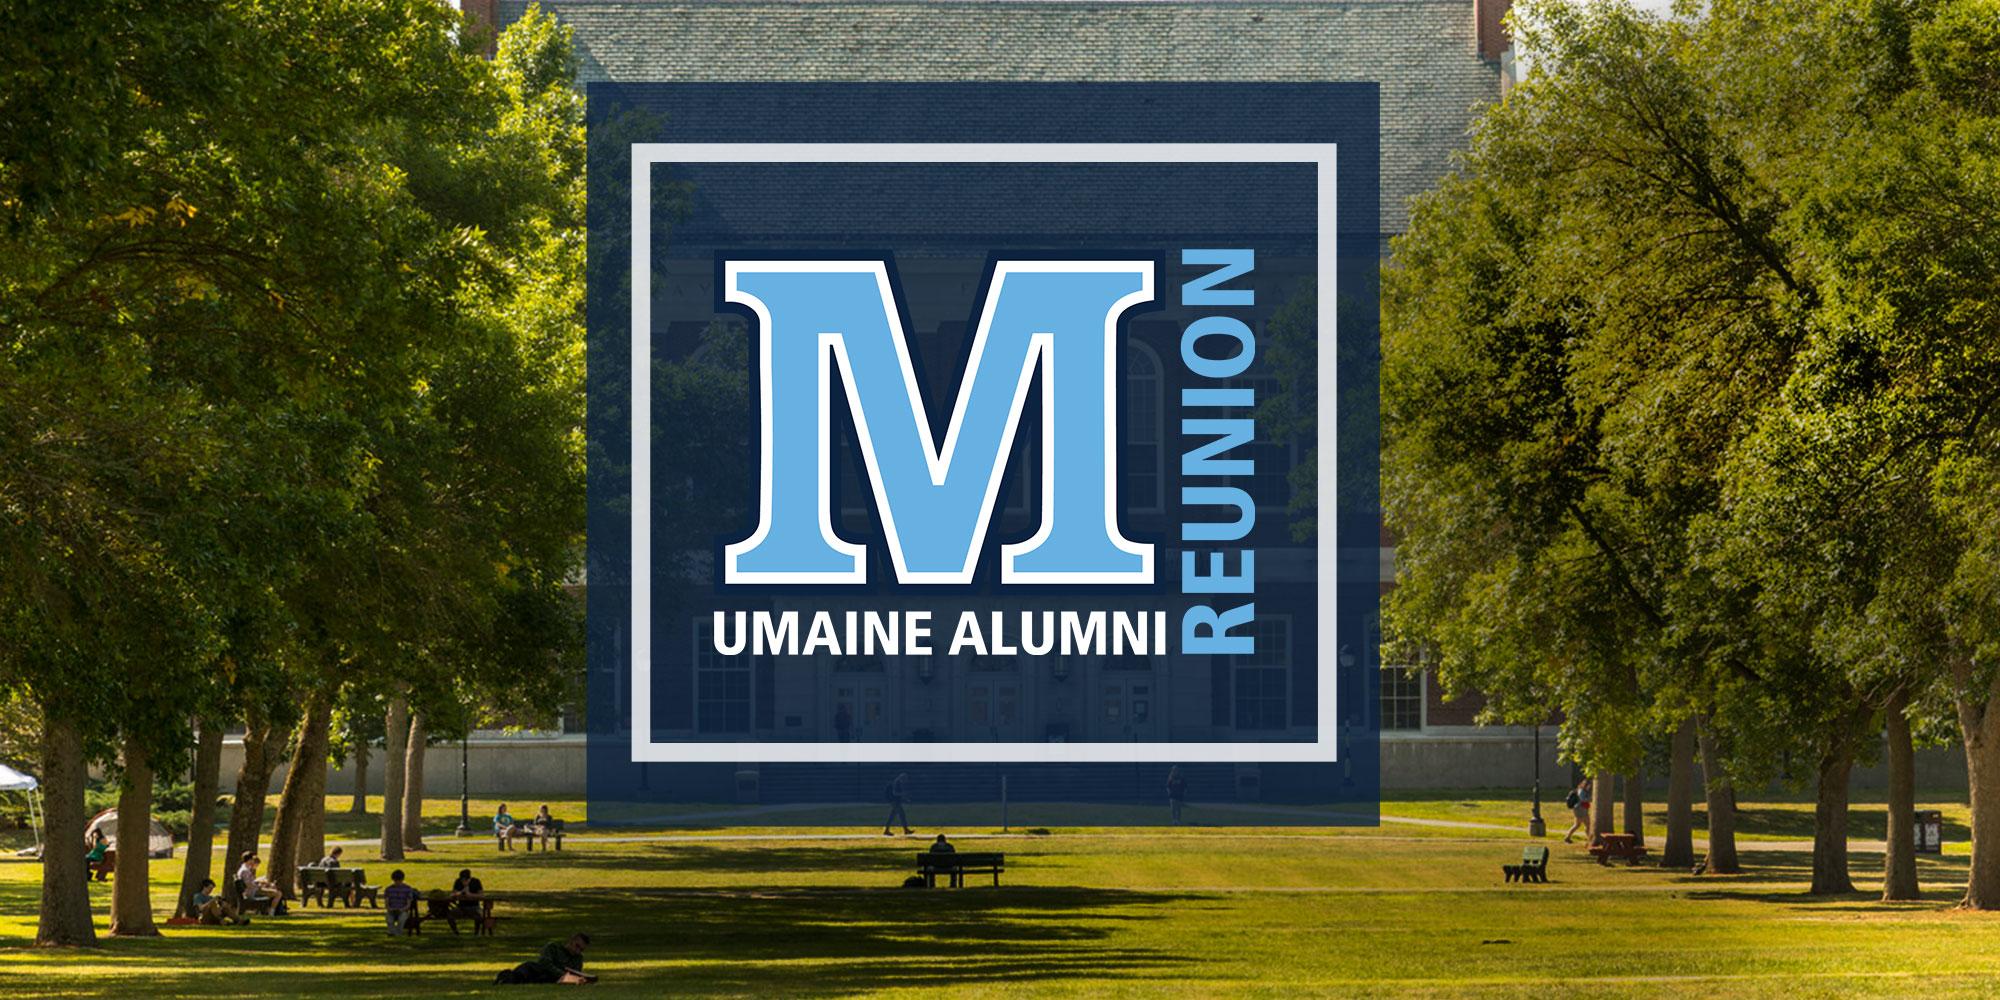 UMaine Alumni Reunion